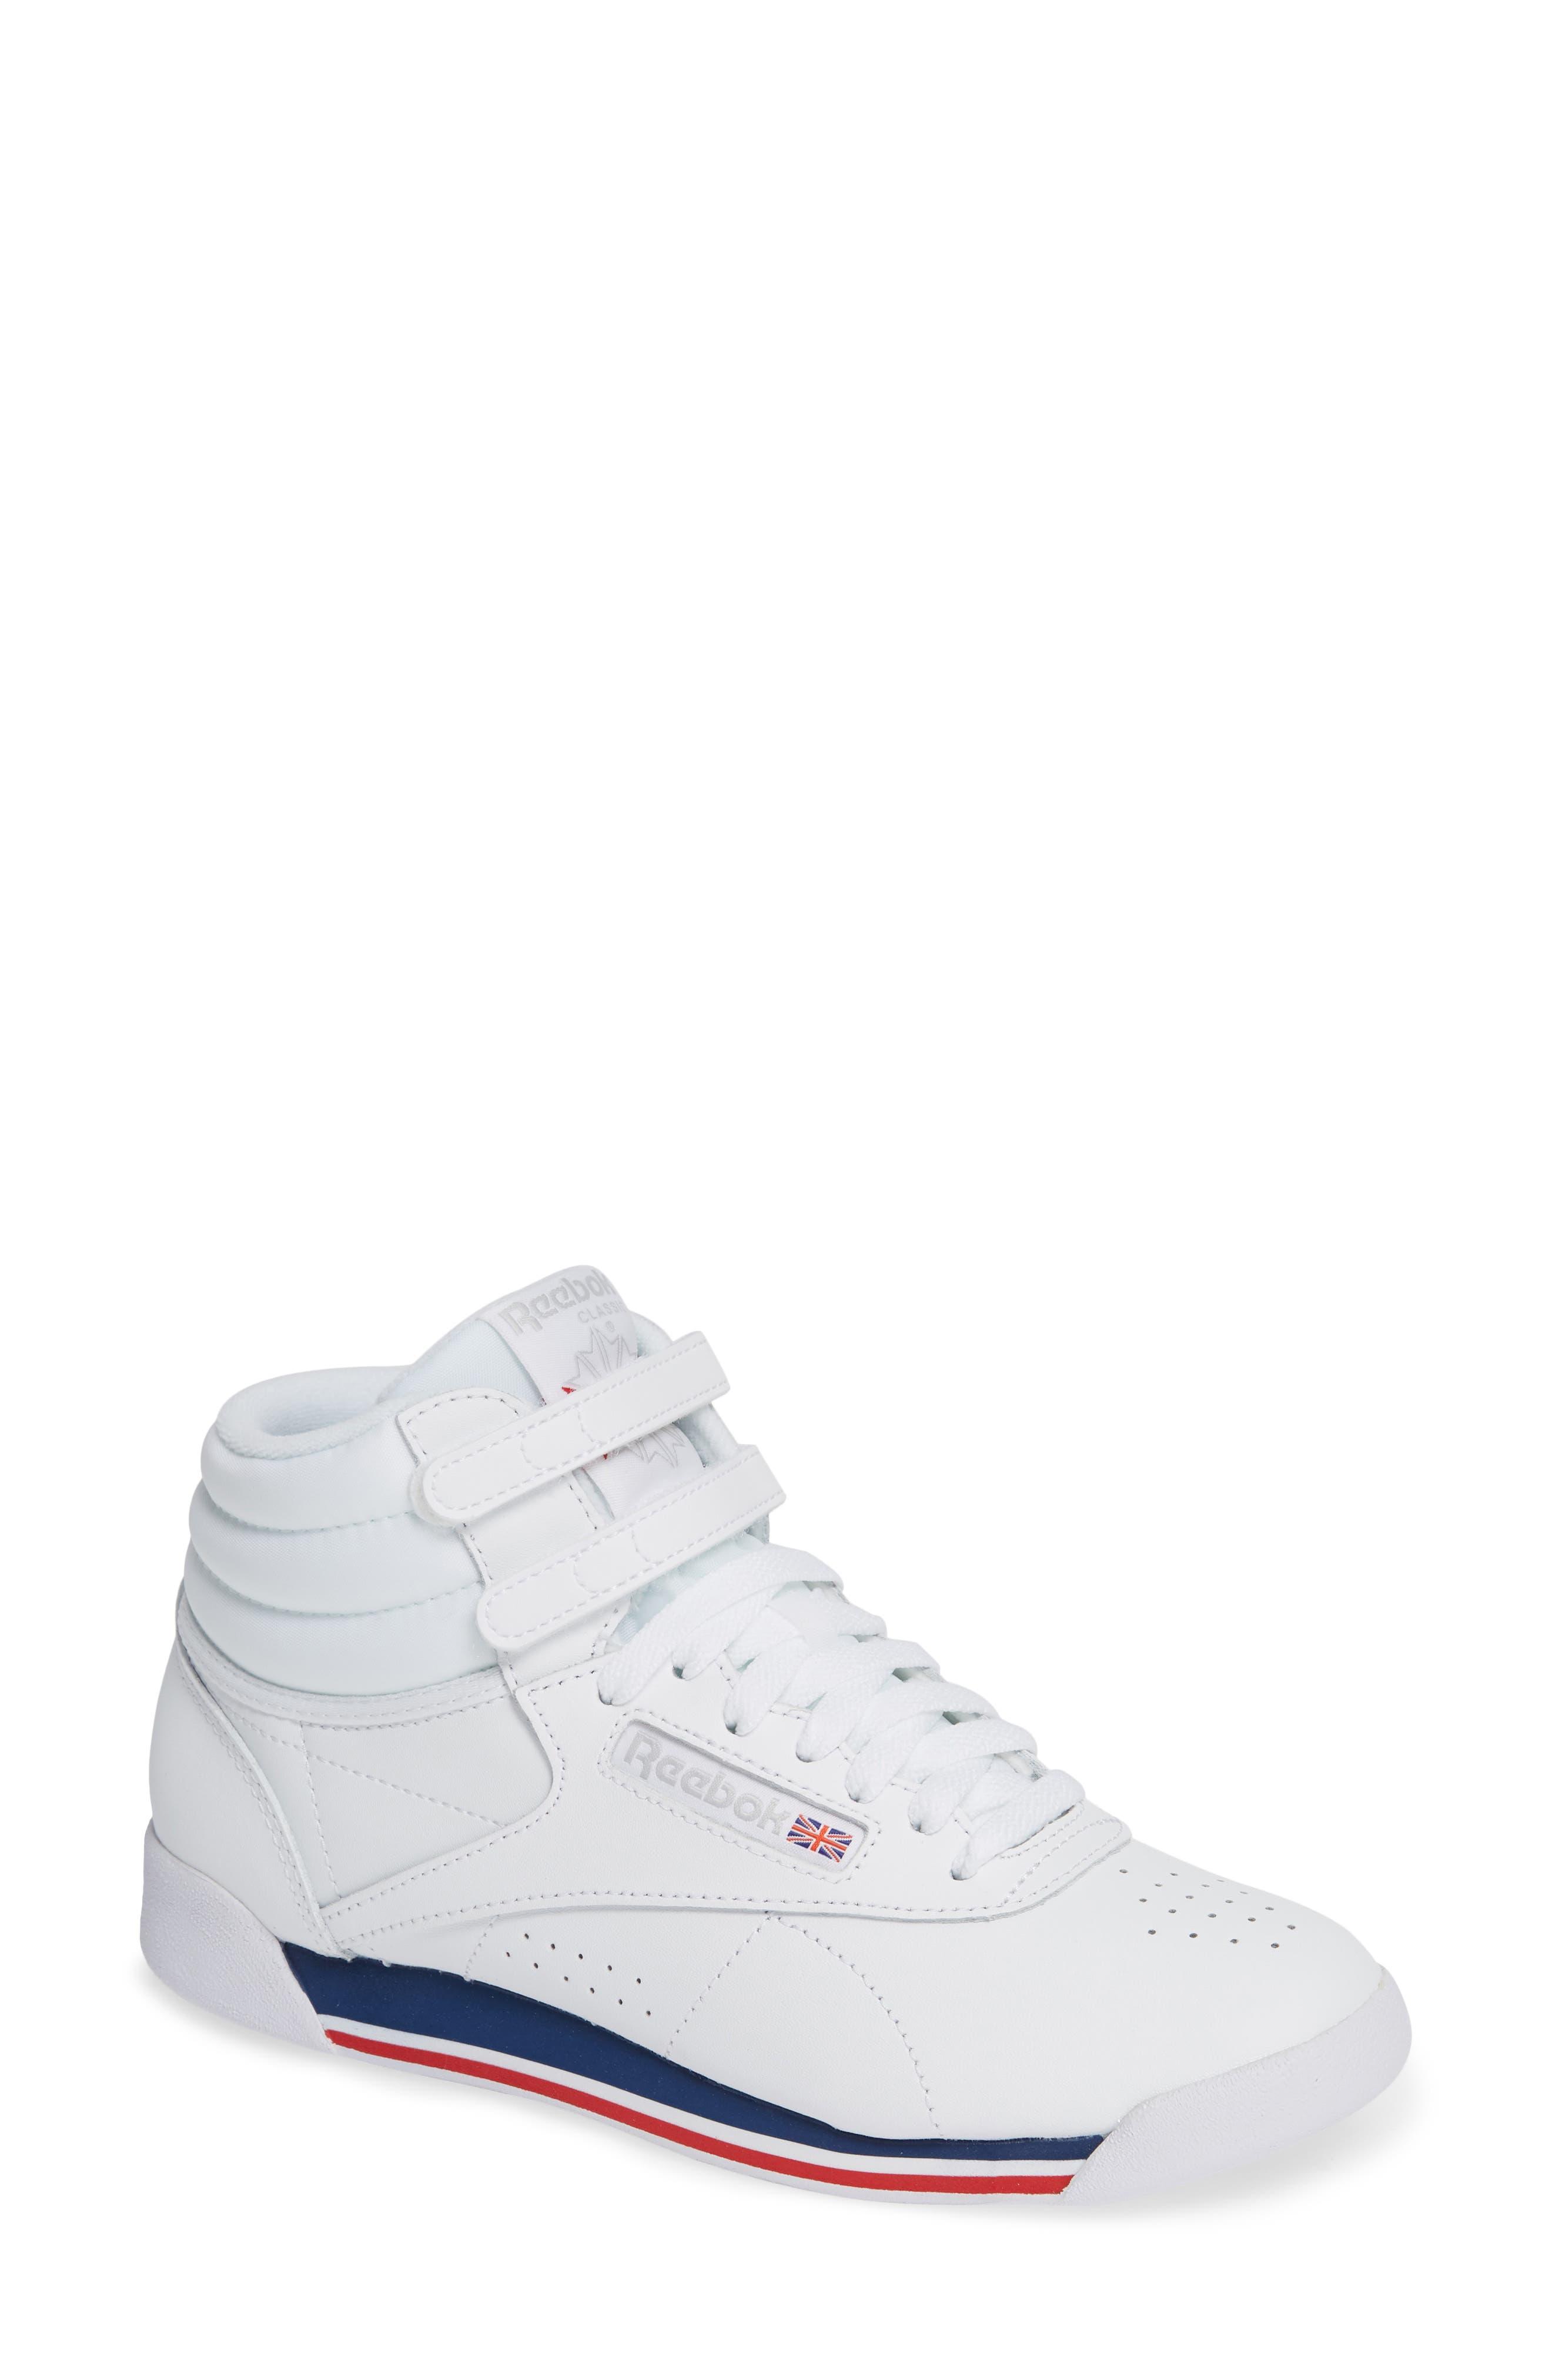 Freestyle Hi Sneaker,                         Main,                         color, 101